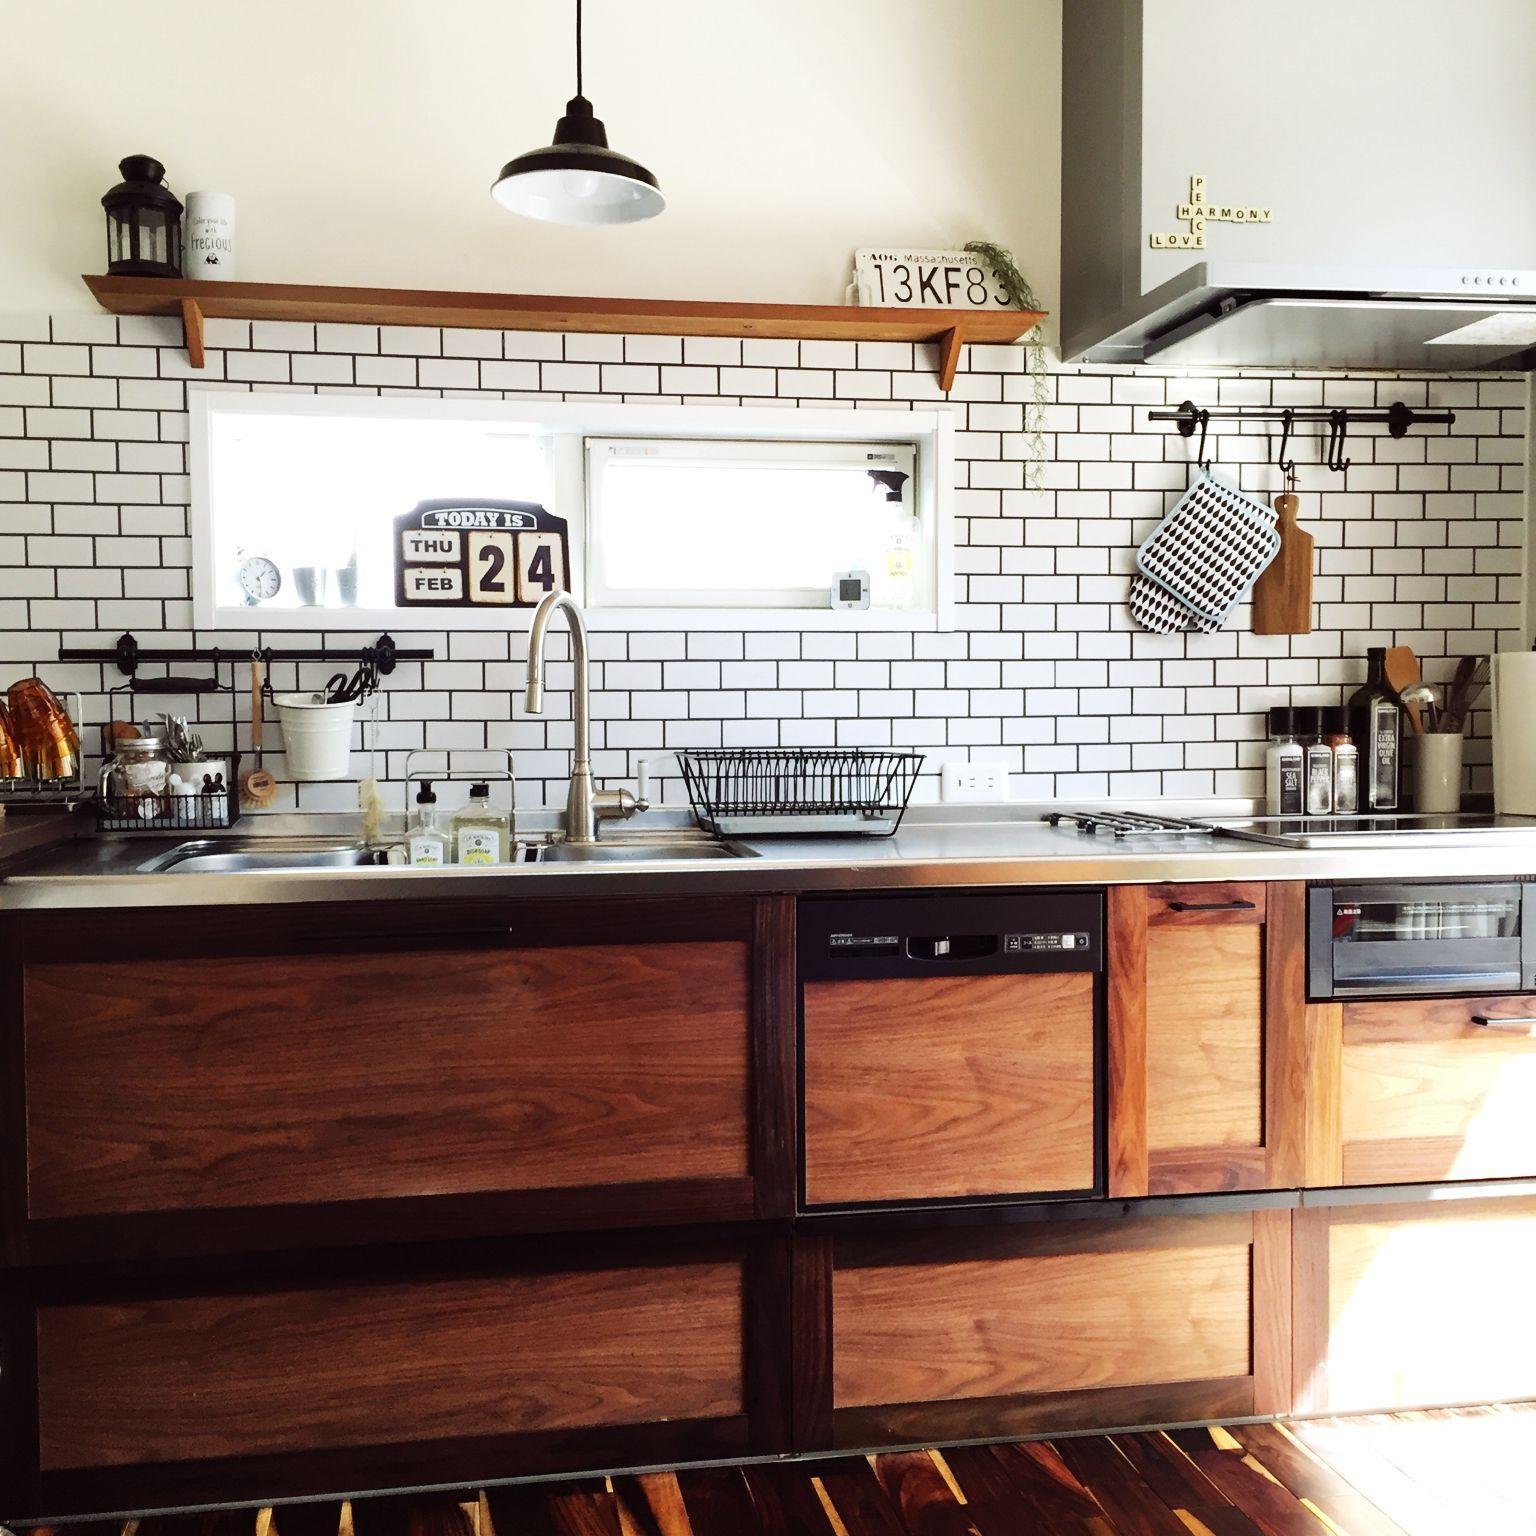 Sungai Buloh Luxury Kitchen: キッチン/IKEA/カフェ風/男前/海外インテリアに憧れる/サリュ...などのインテリア実例